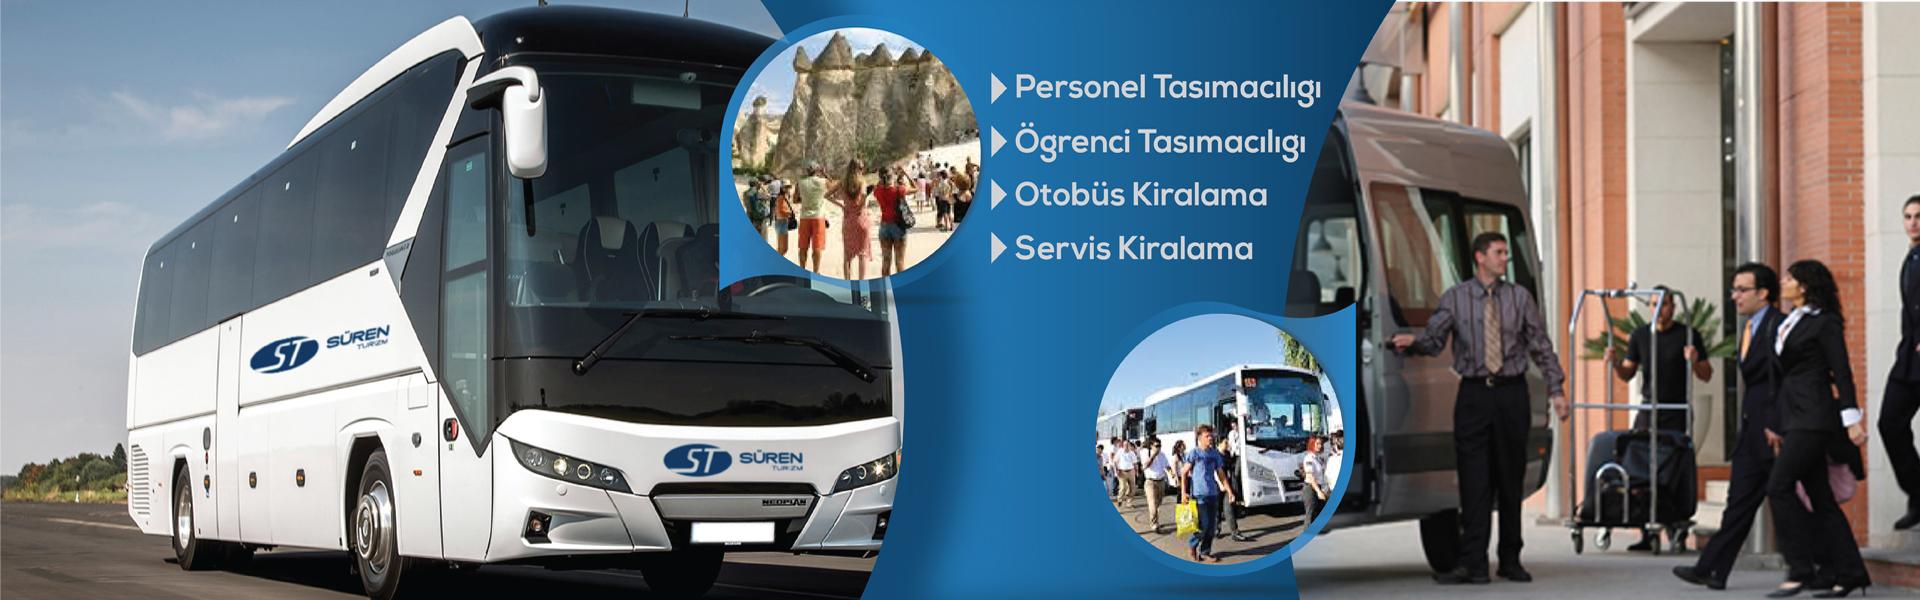 istanbul otobüs kiralama